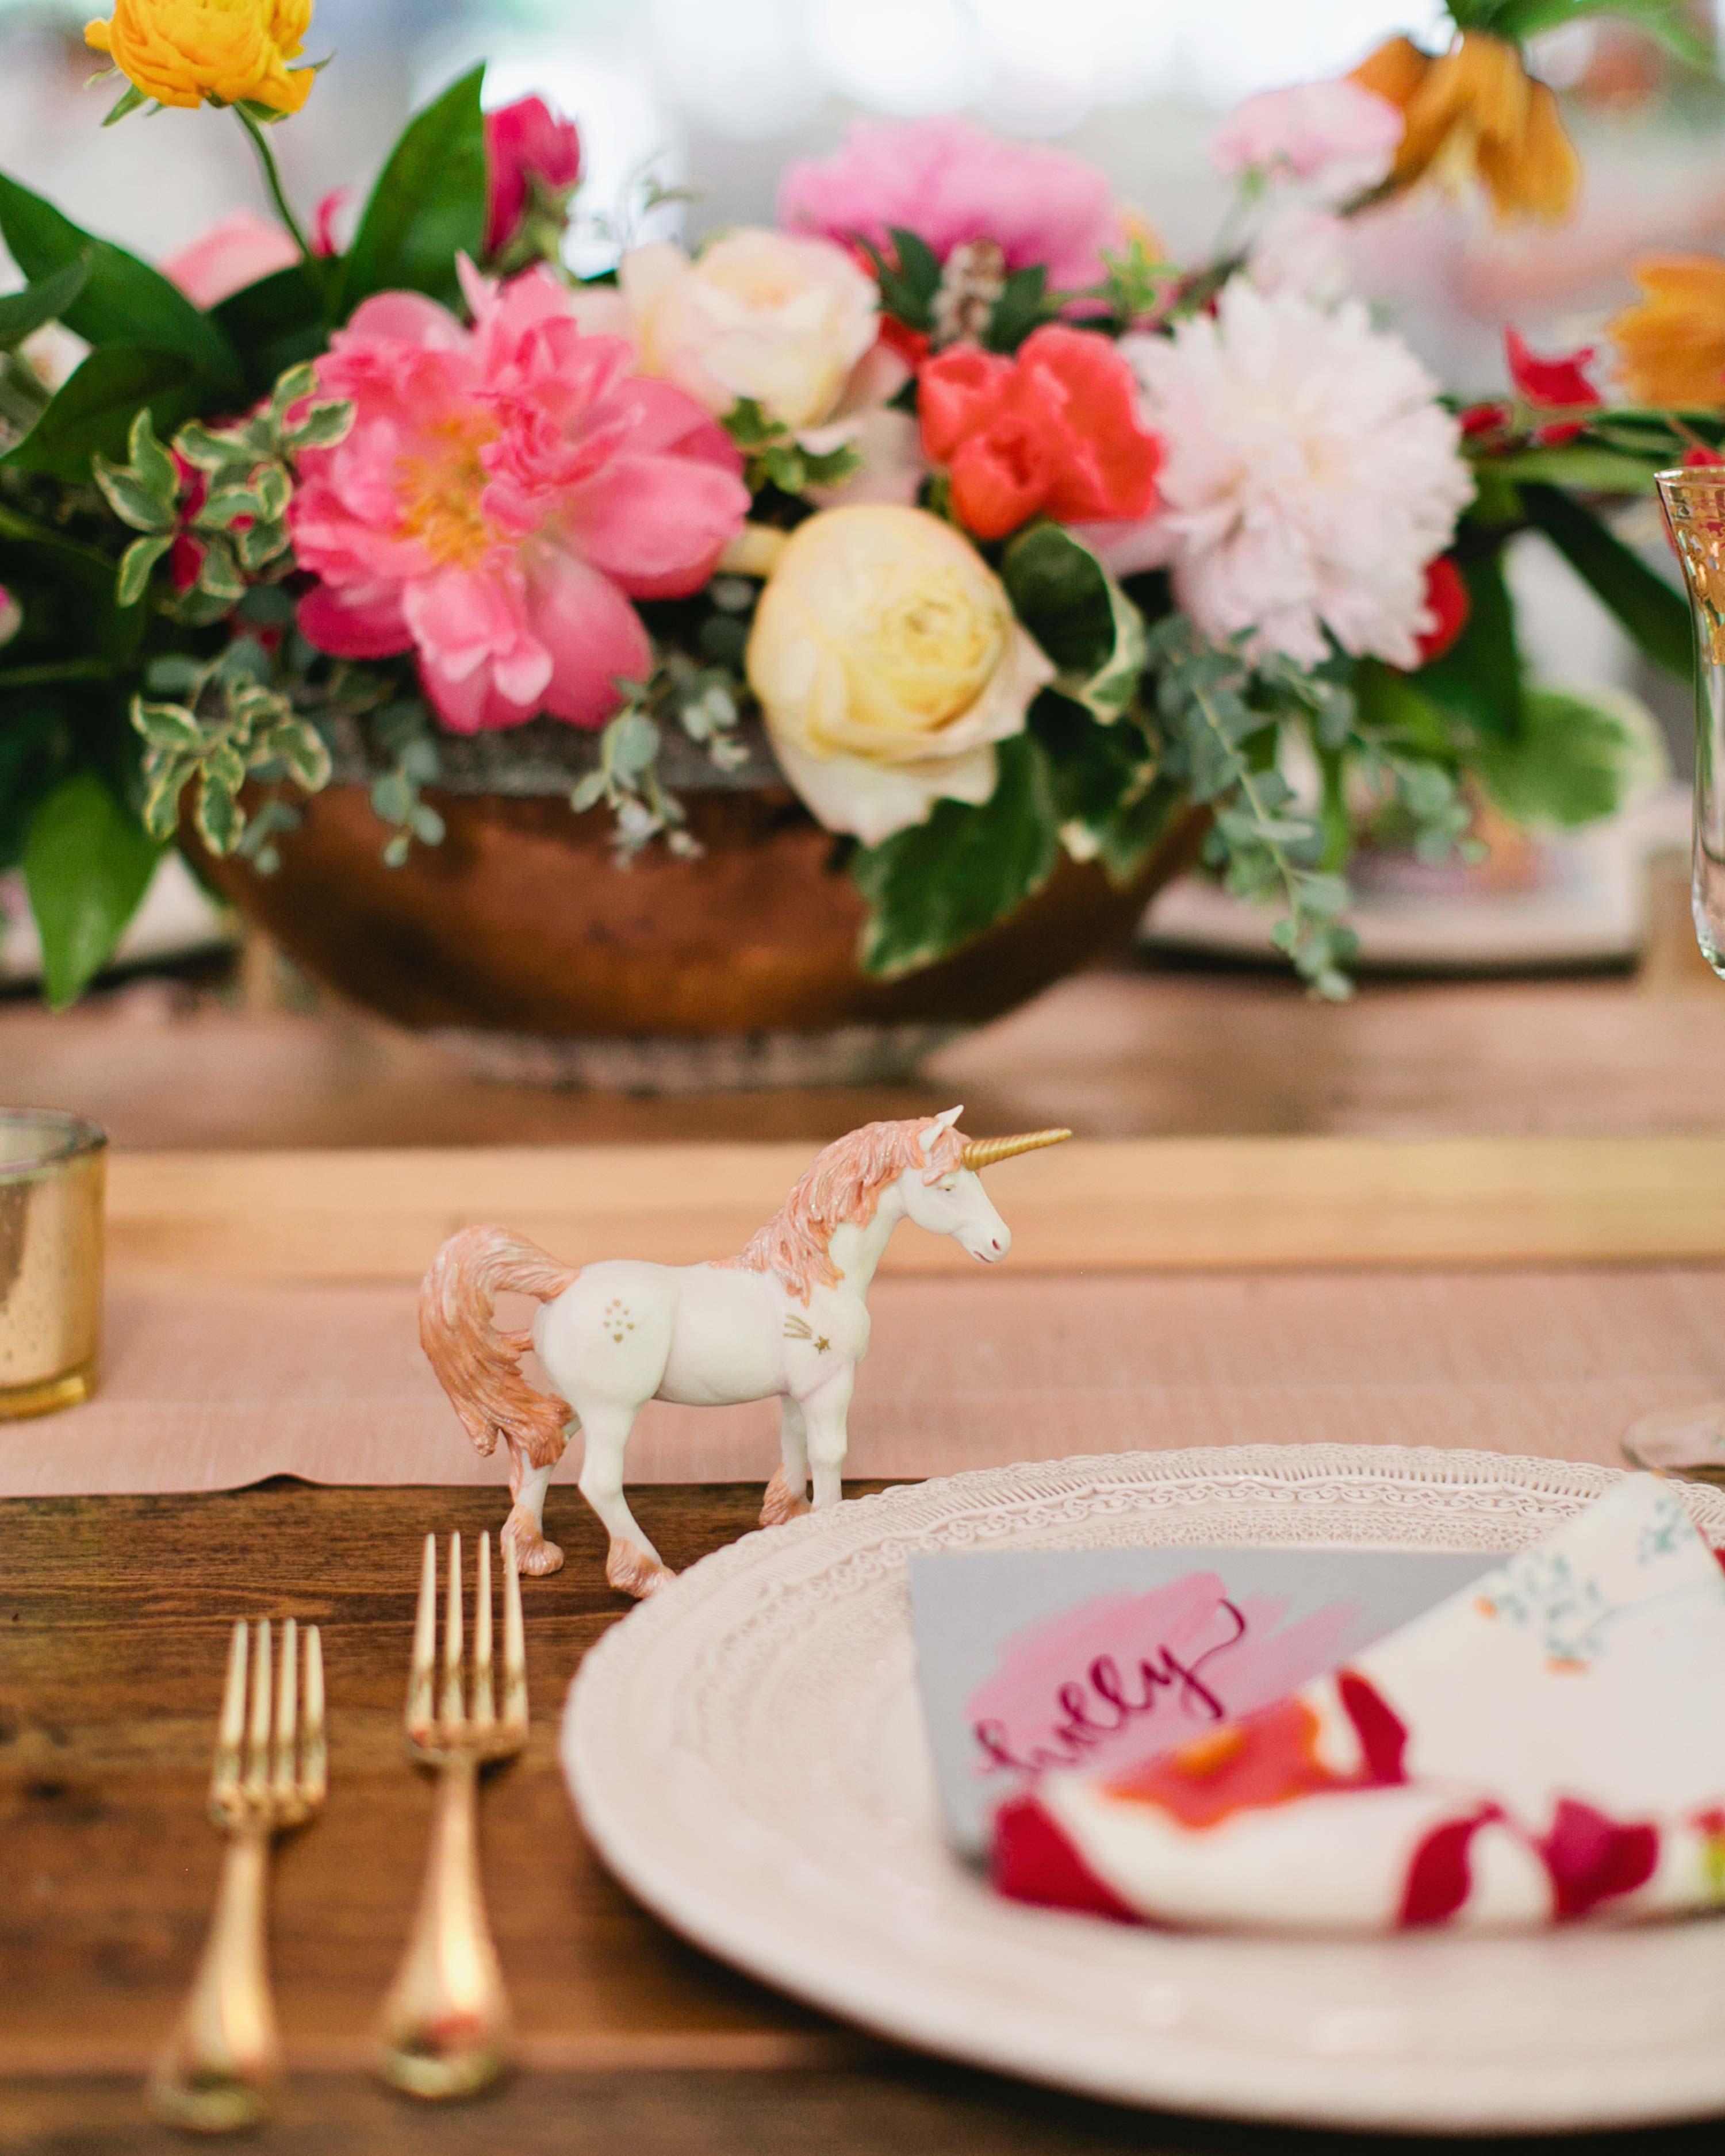 holly-john-wedding-texas-unicorn-placesetting-063-s112833-0516.jpg